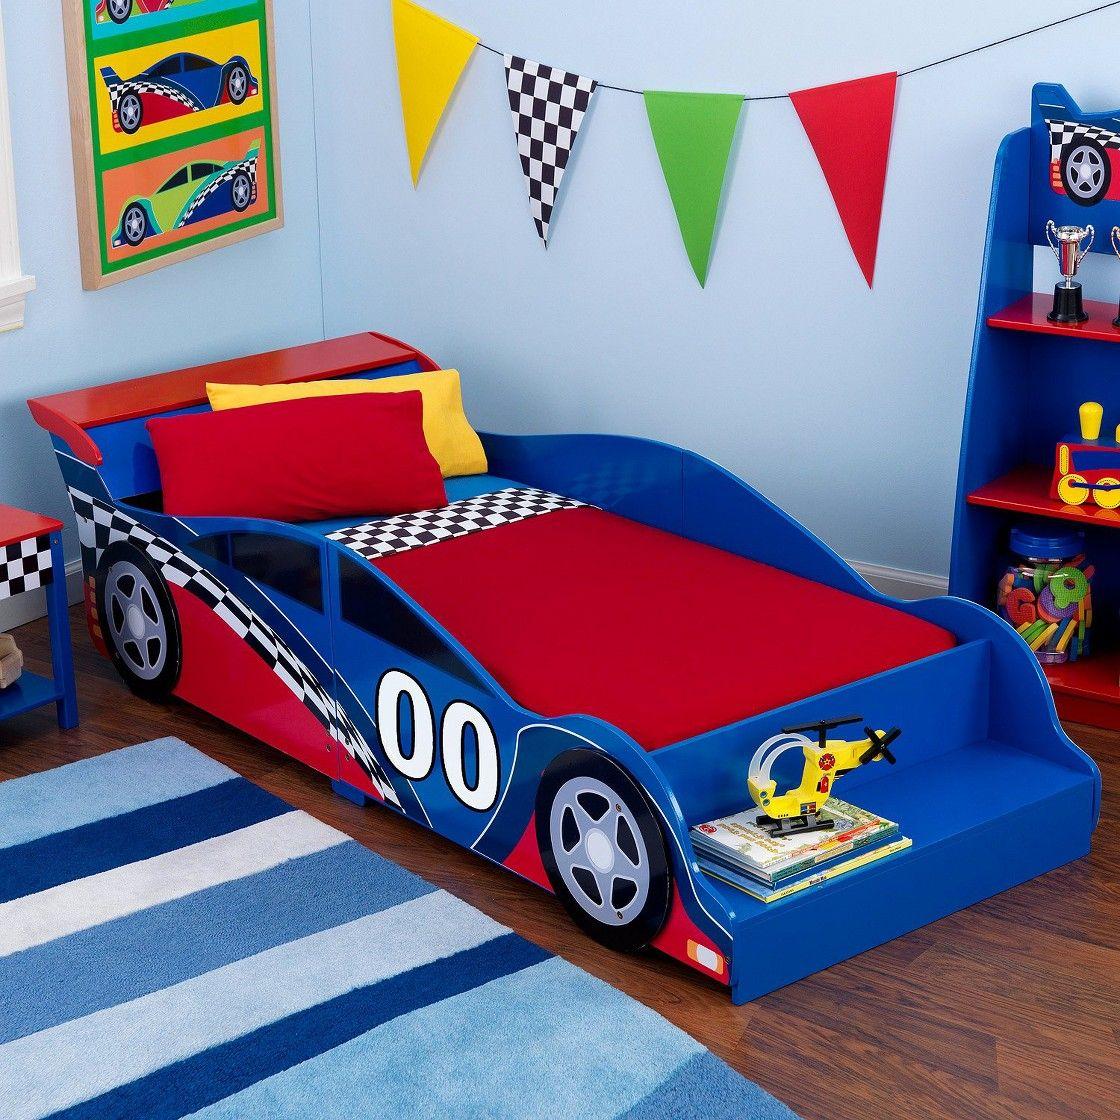 KidKraft Toddler Bed - Race Car   Toddler car bed, Car bed ...